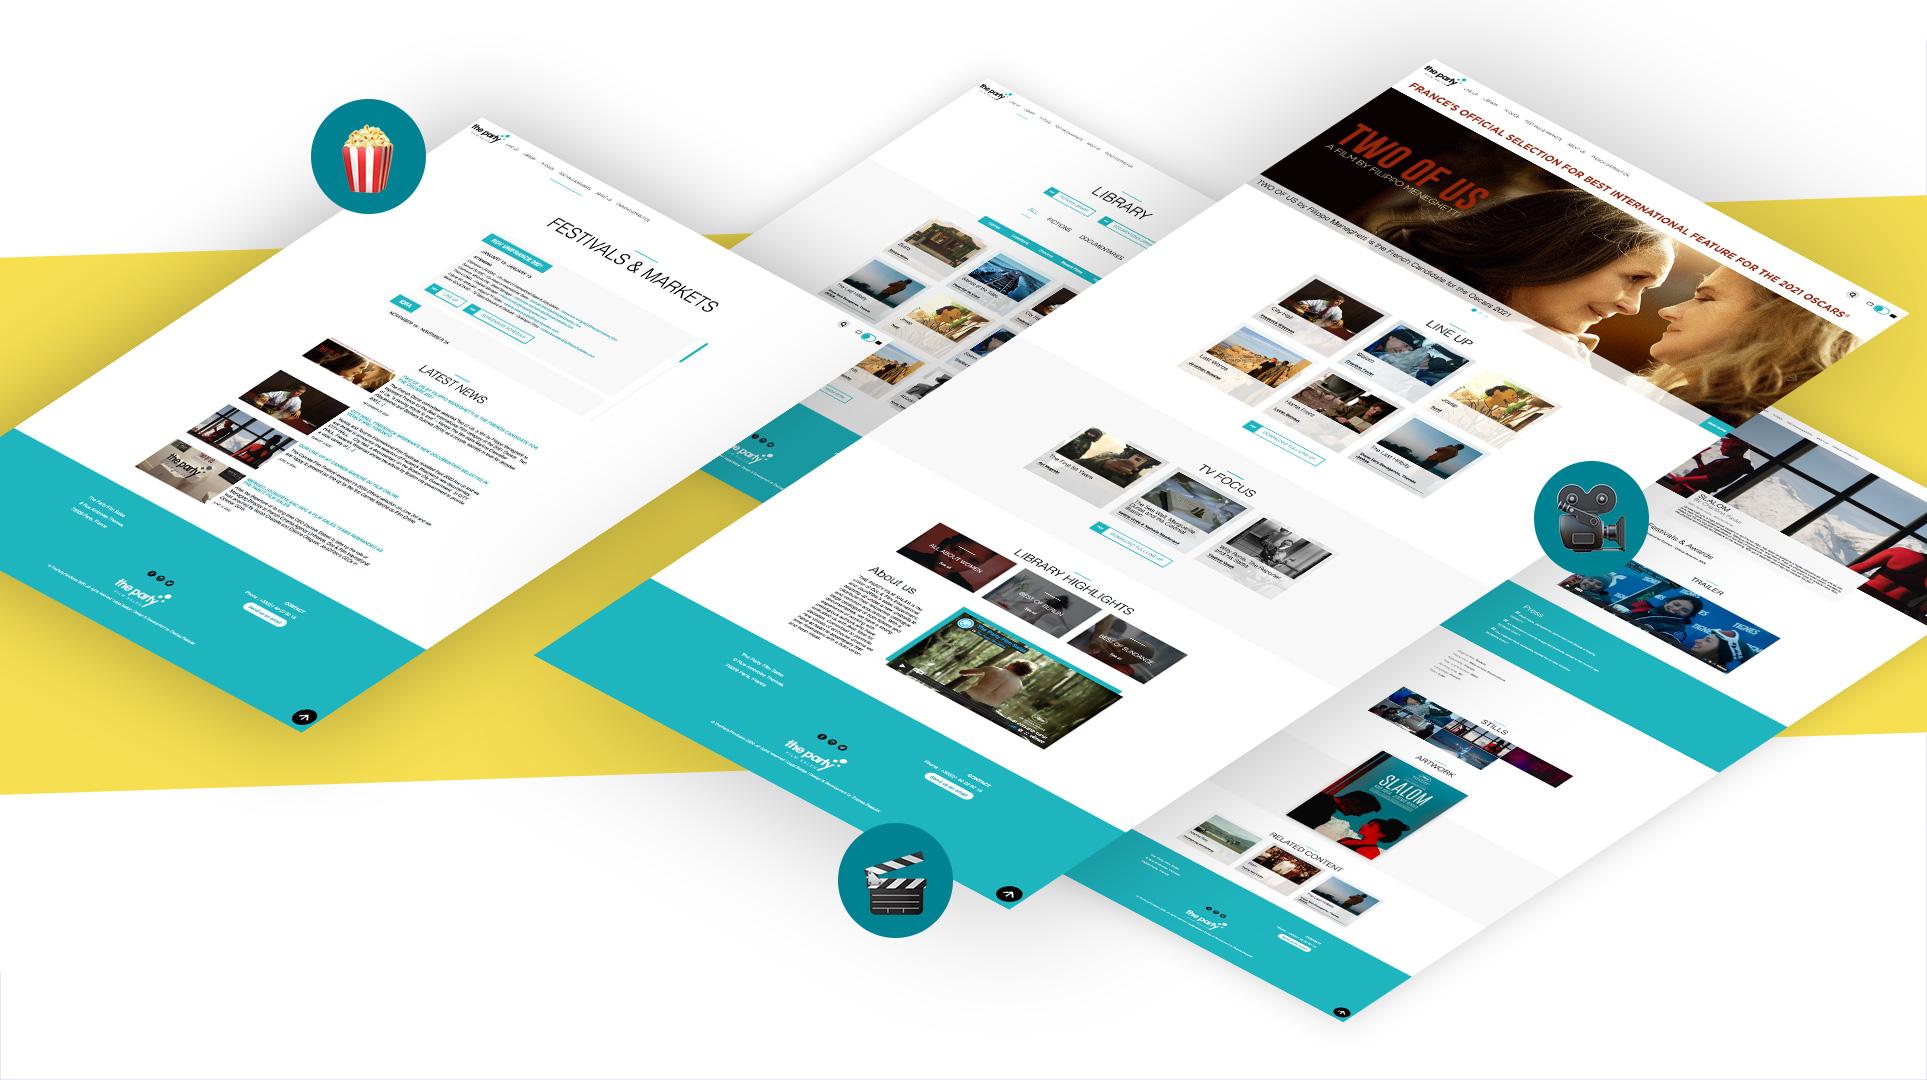 mockup design site vitrine B2B thepartysales